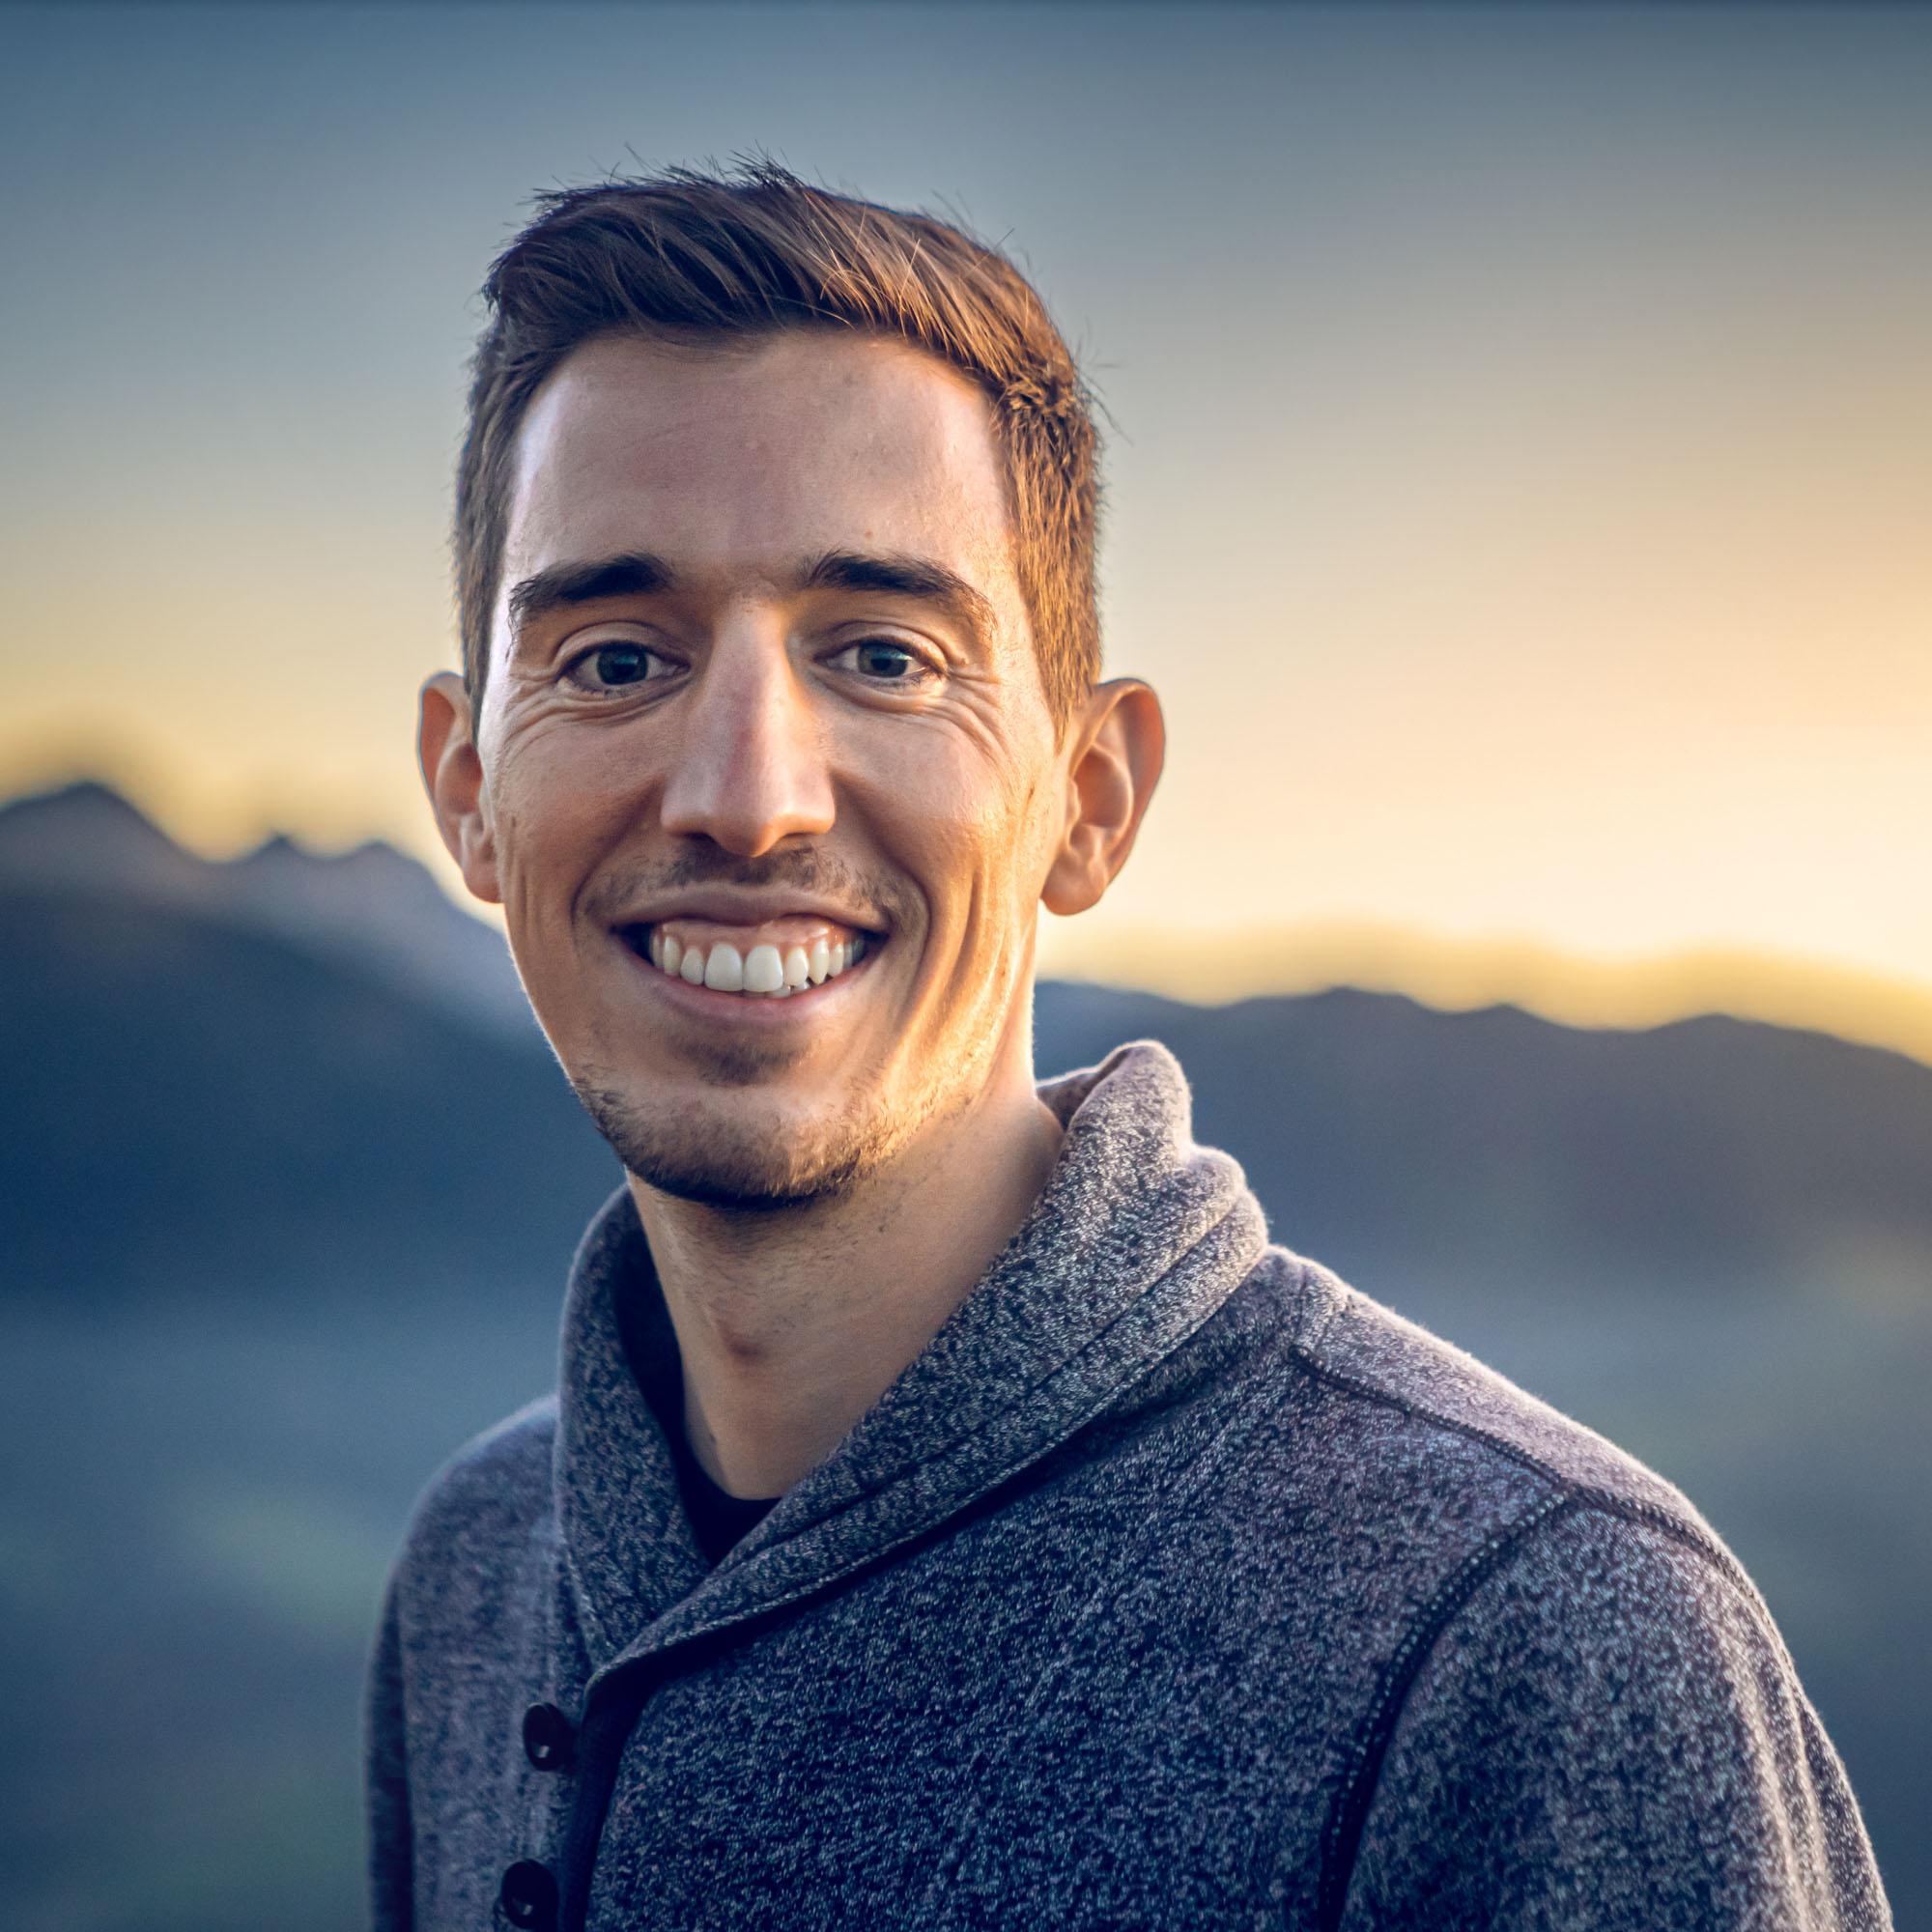 Sebastian Klinger Cinematographer during sunset in mountains